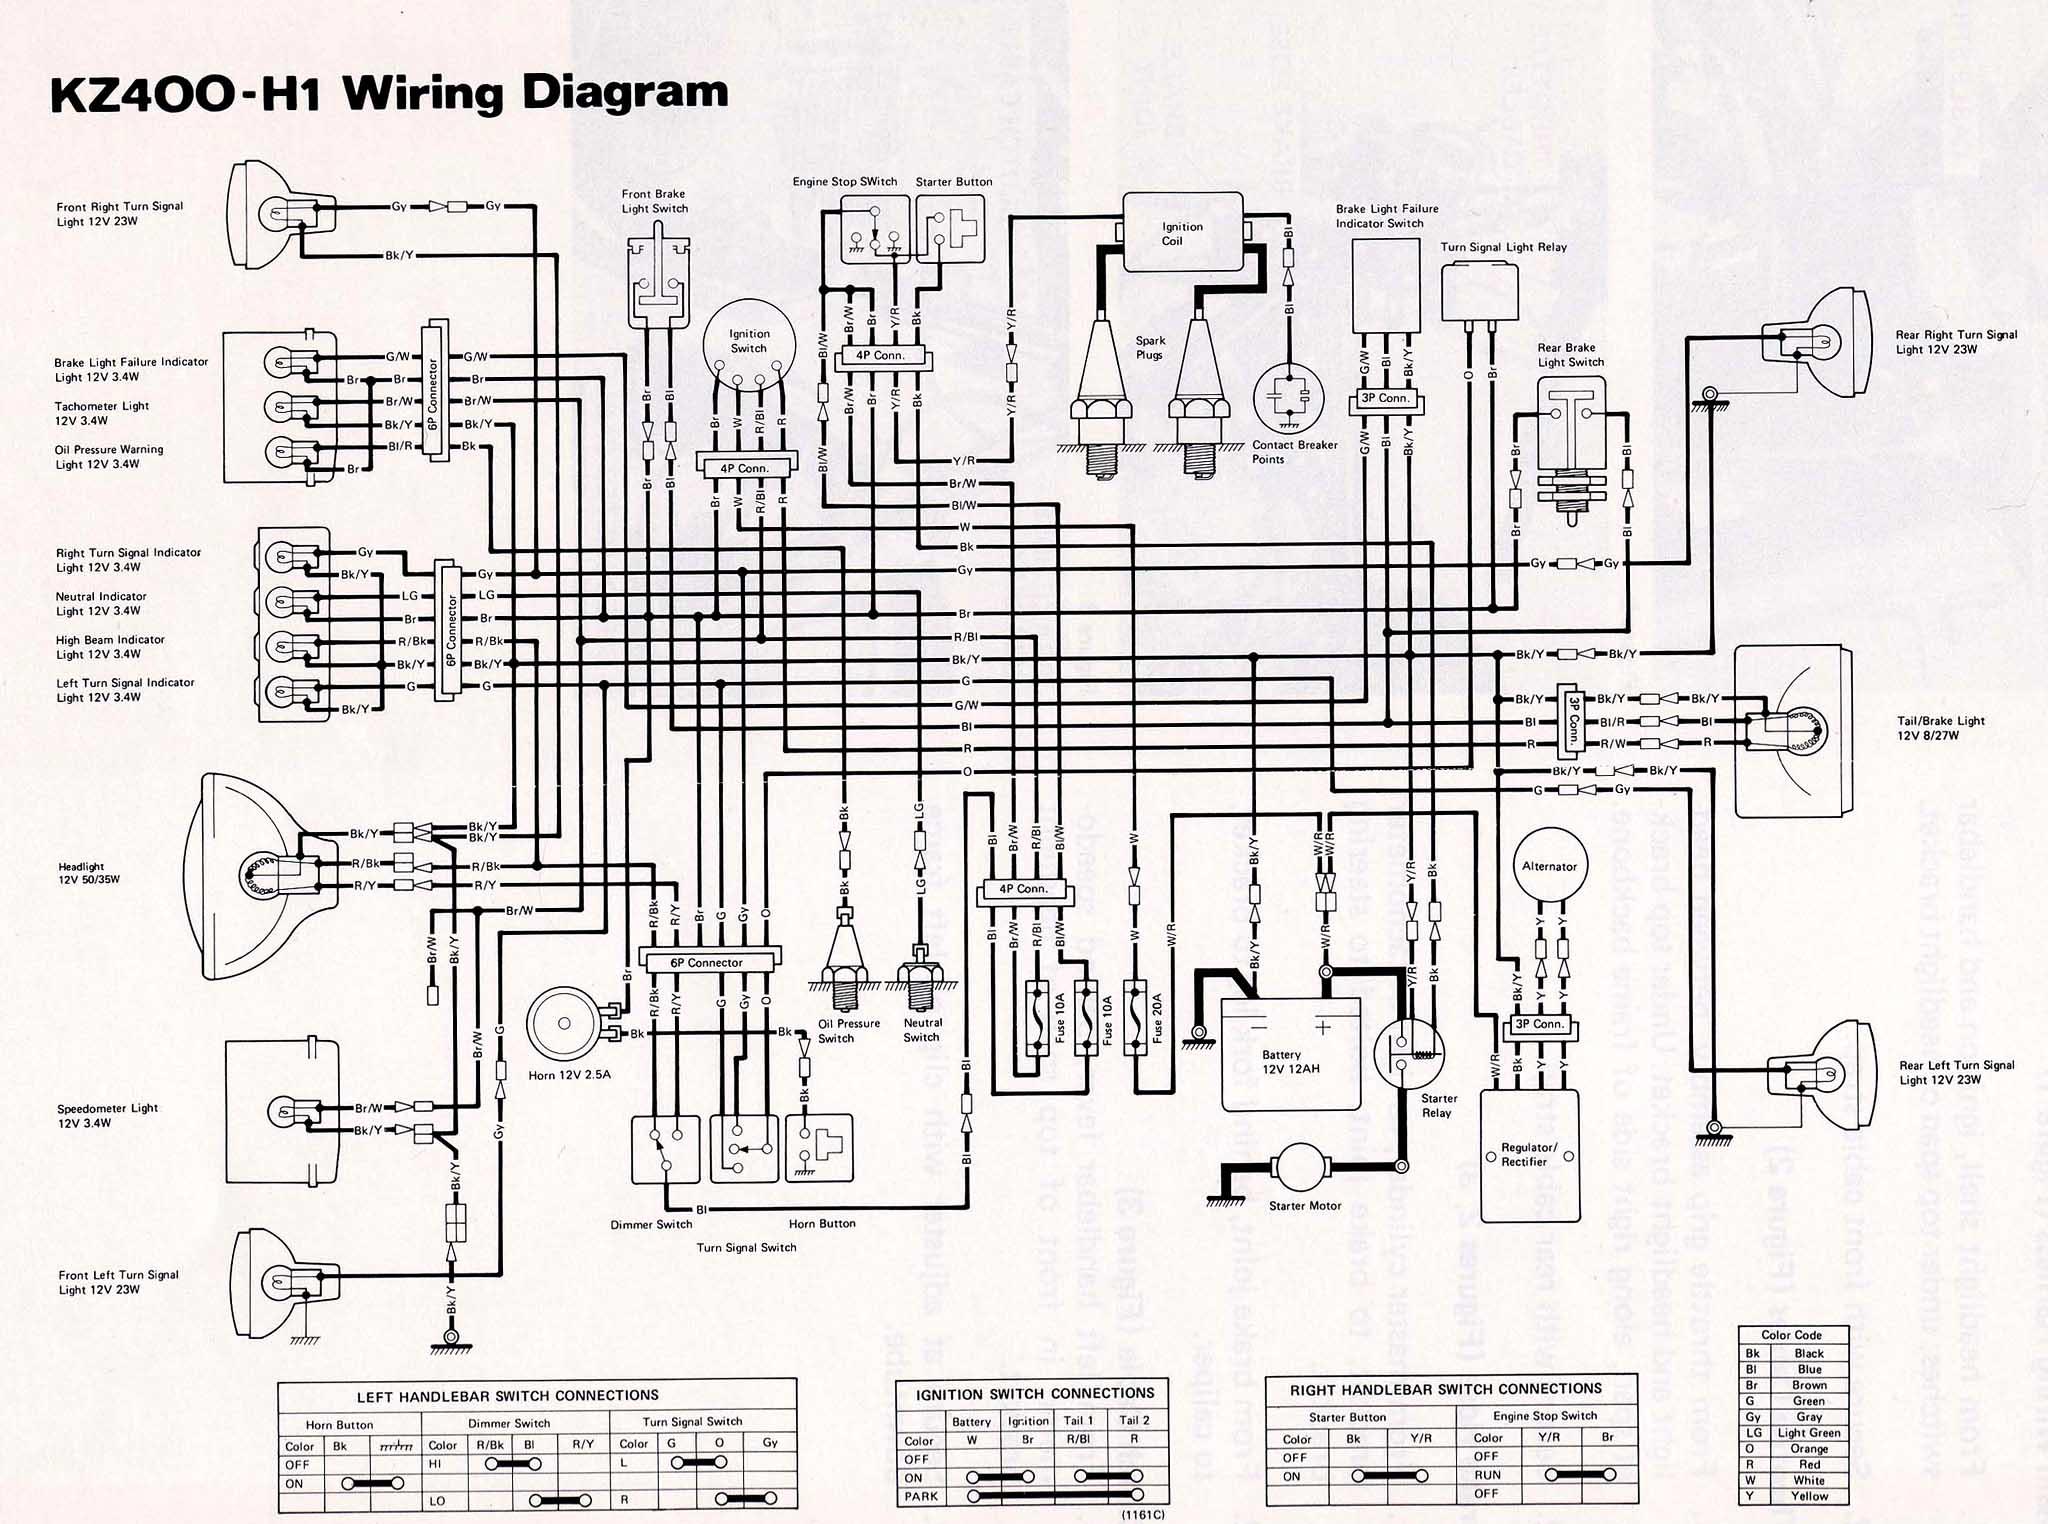 1978 kawasaki z1r wiring diagram